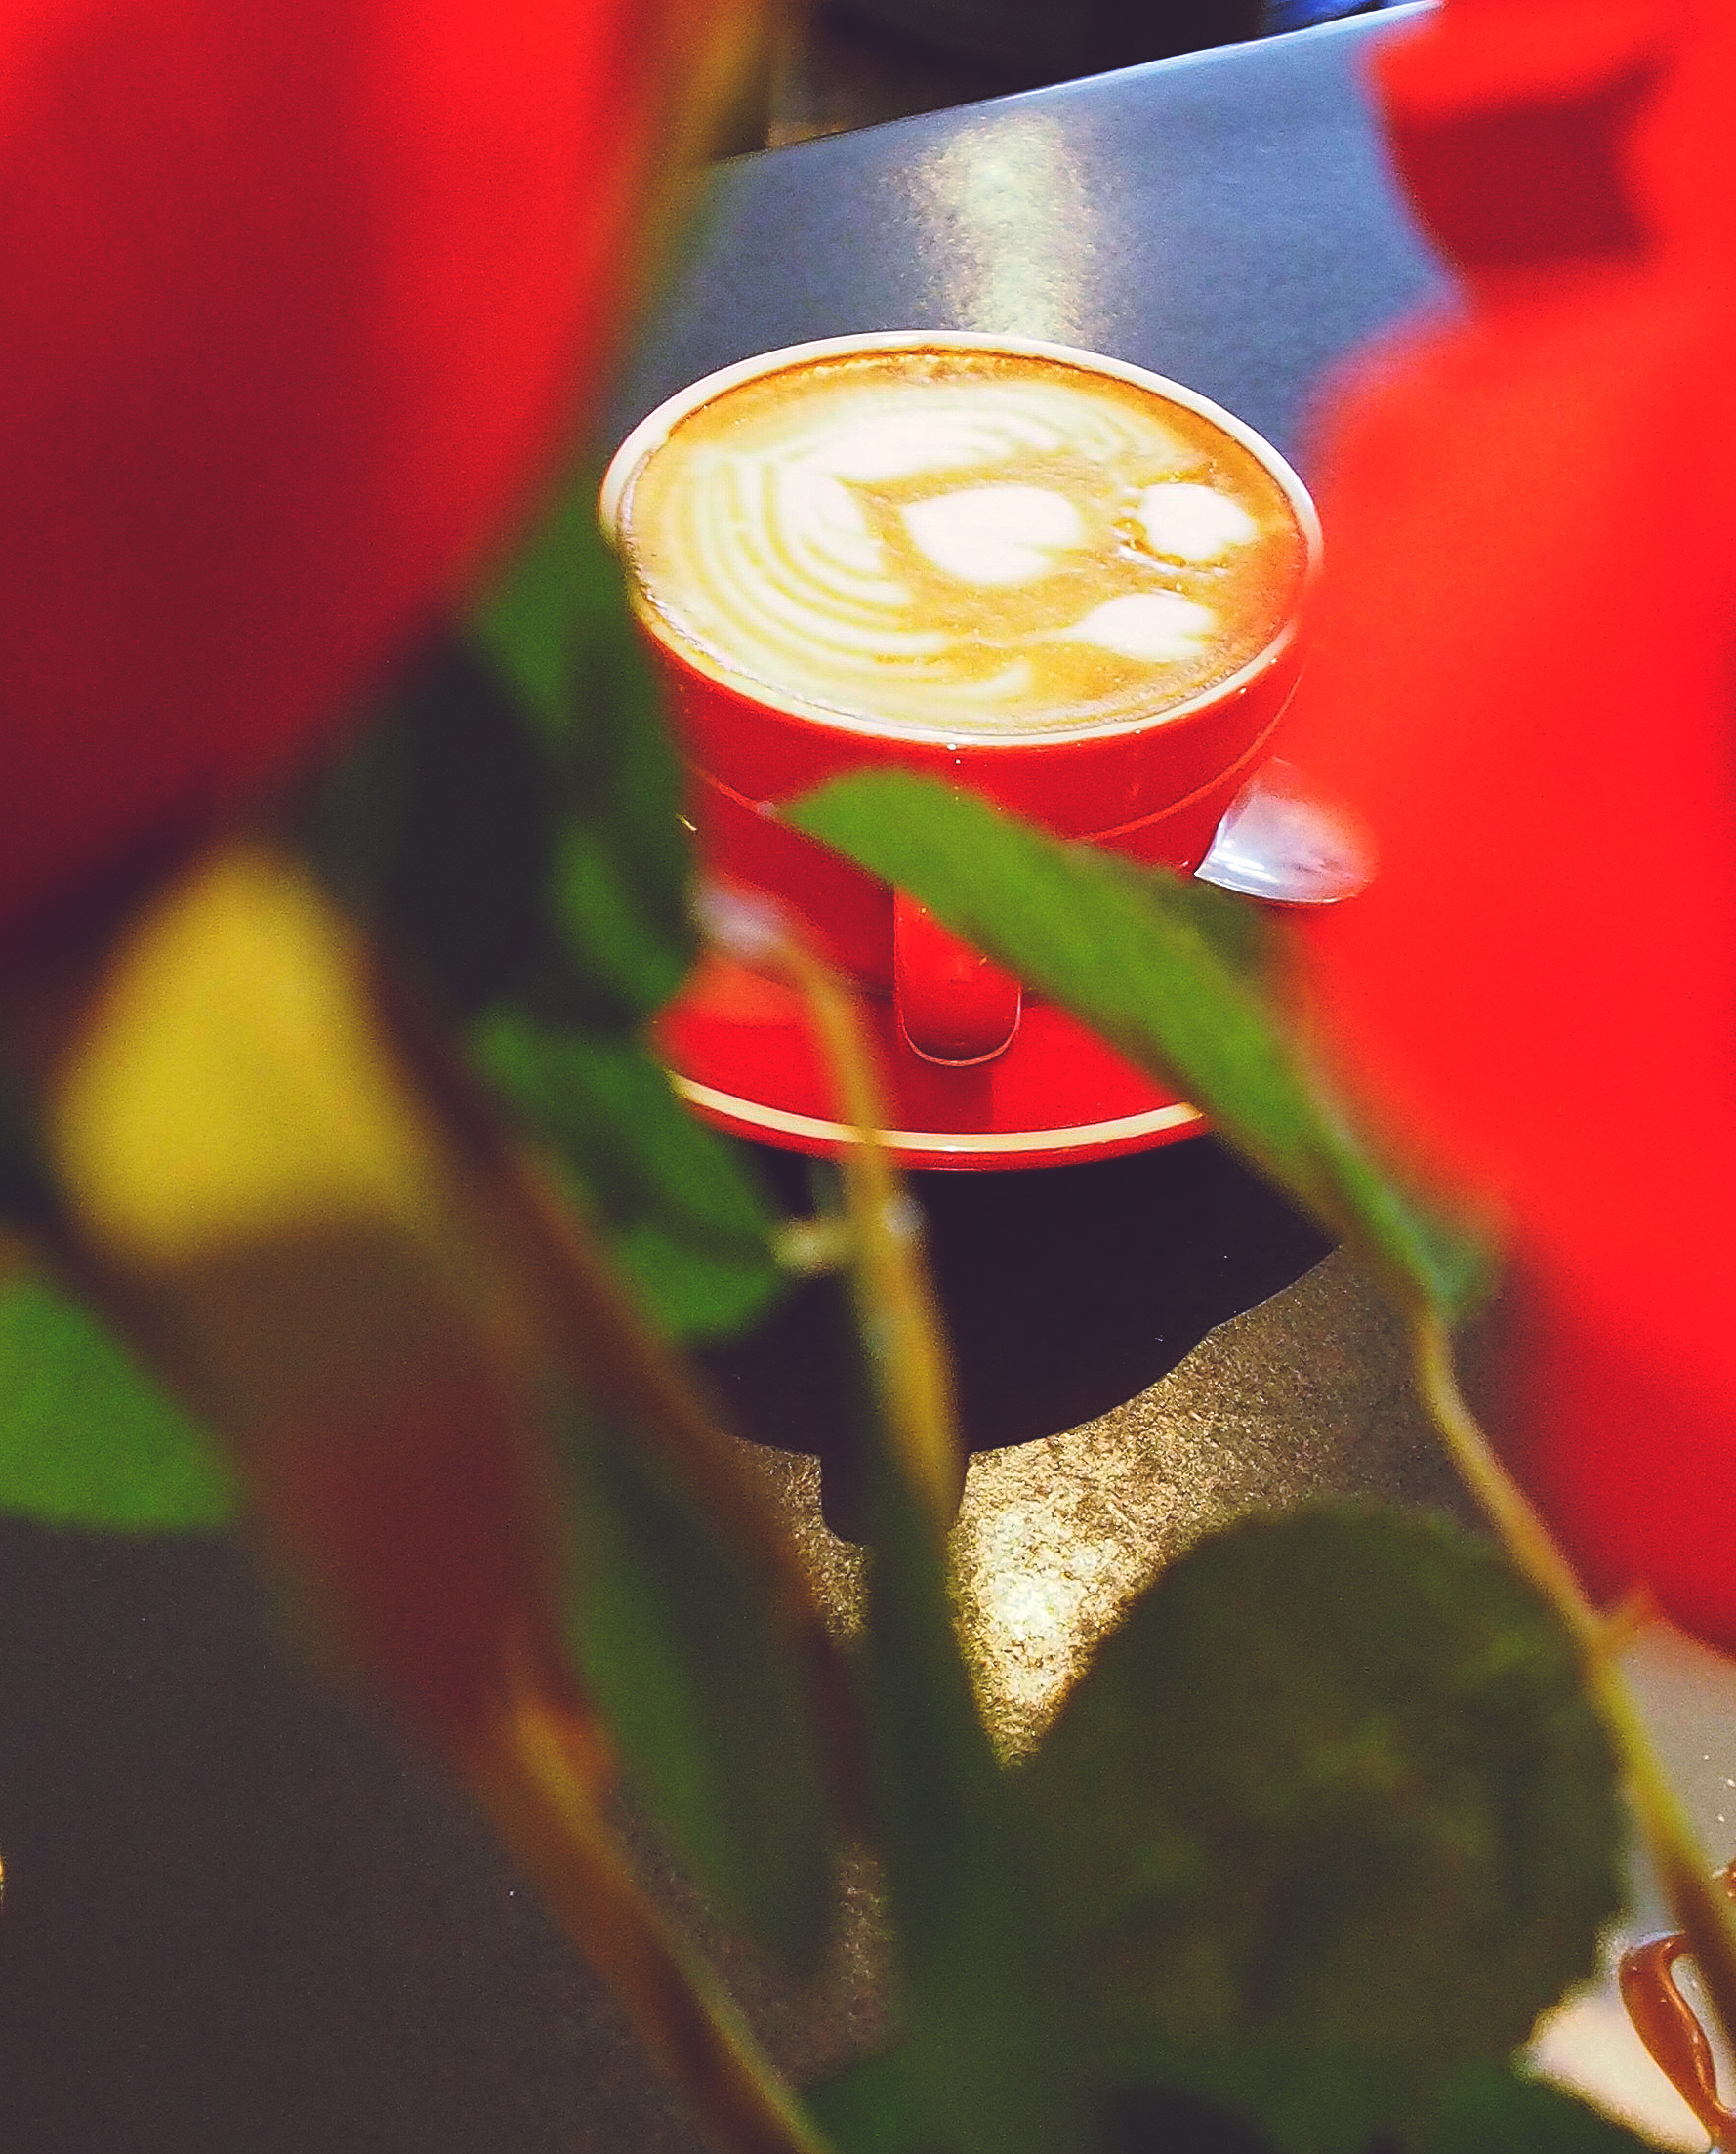 P1010100 peeping coffee